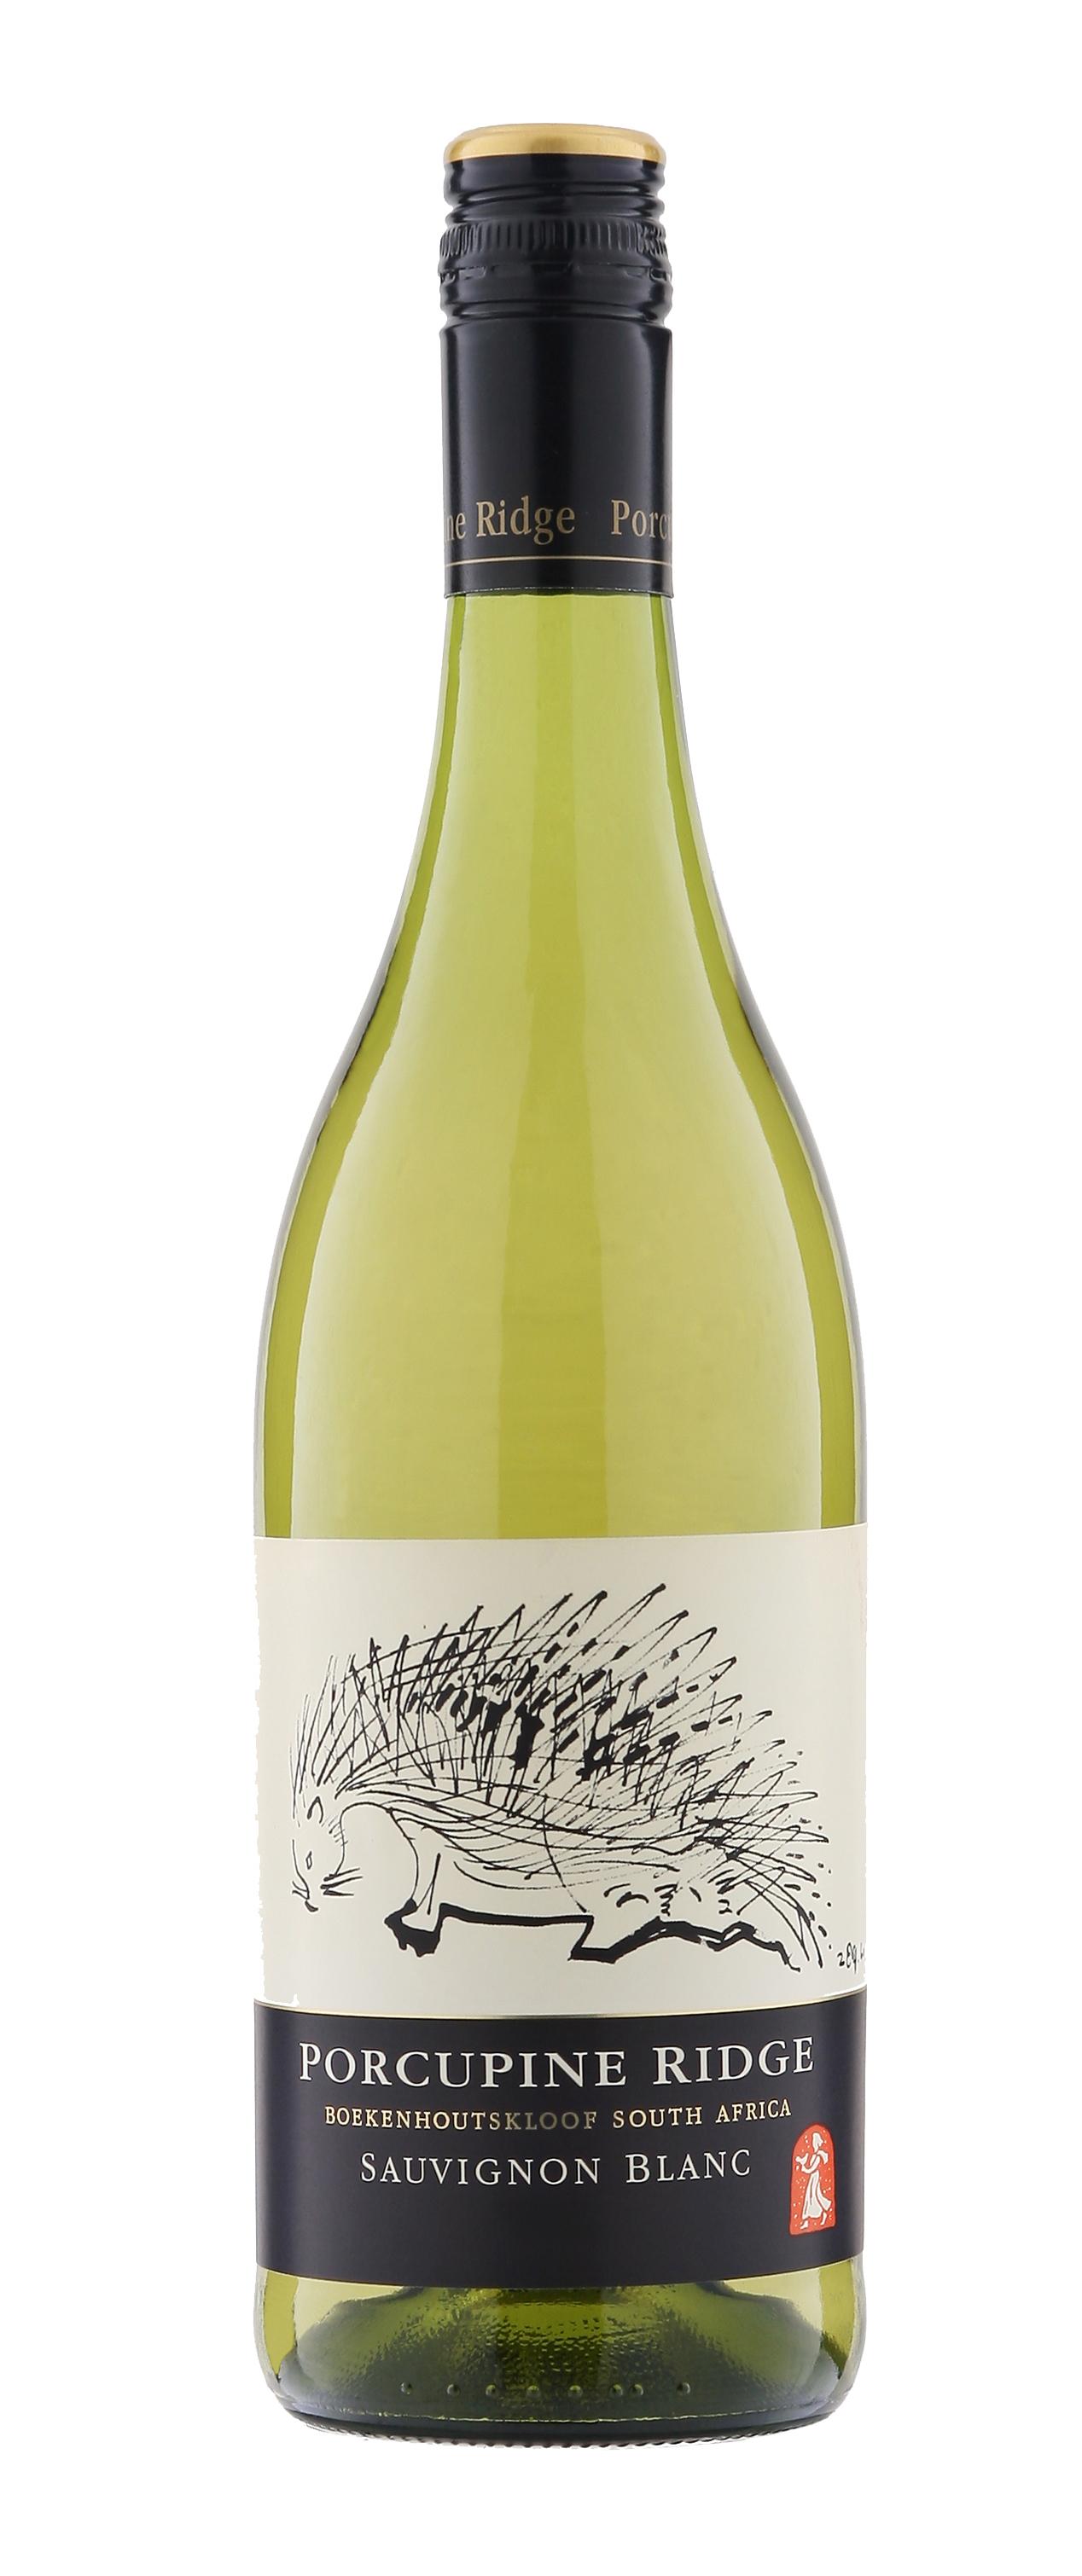 Porcupine Ridge Sauvignon Blanc Bottle.jpg